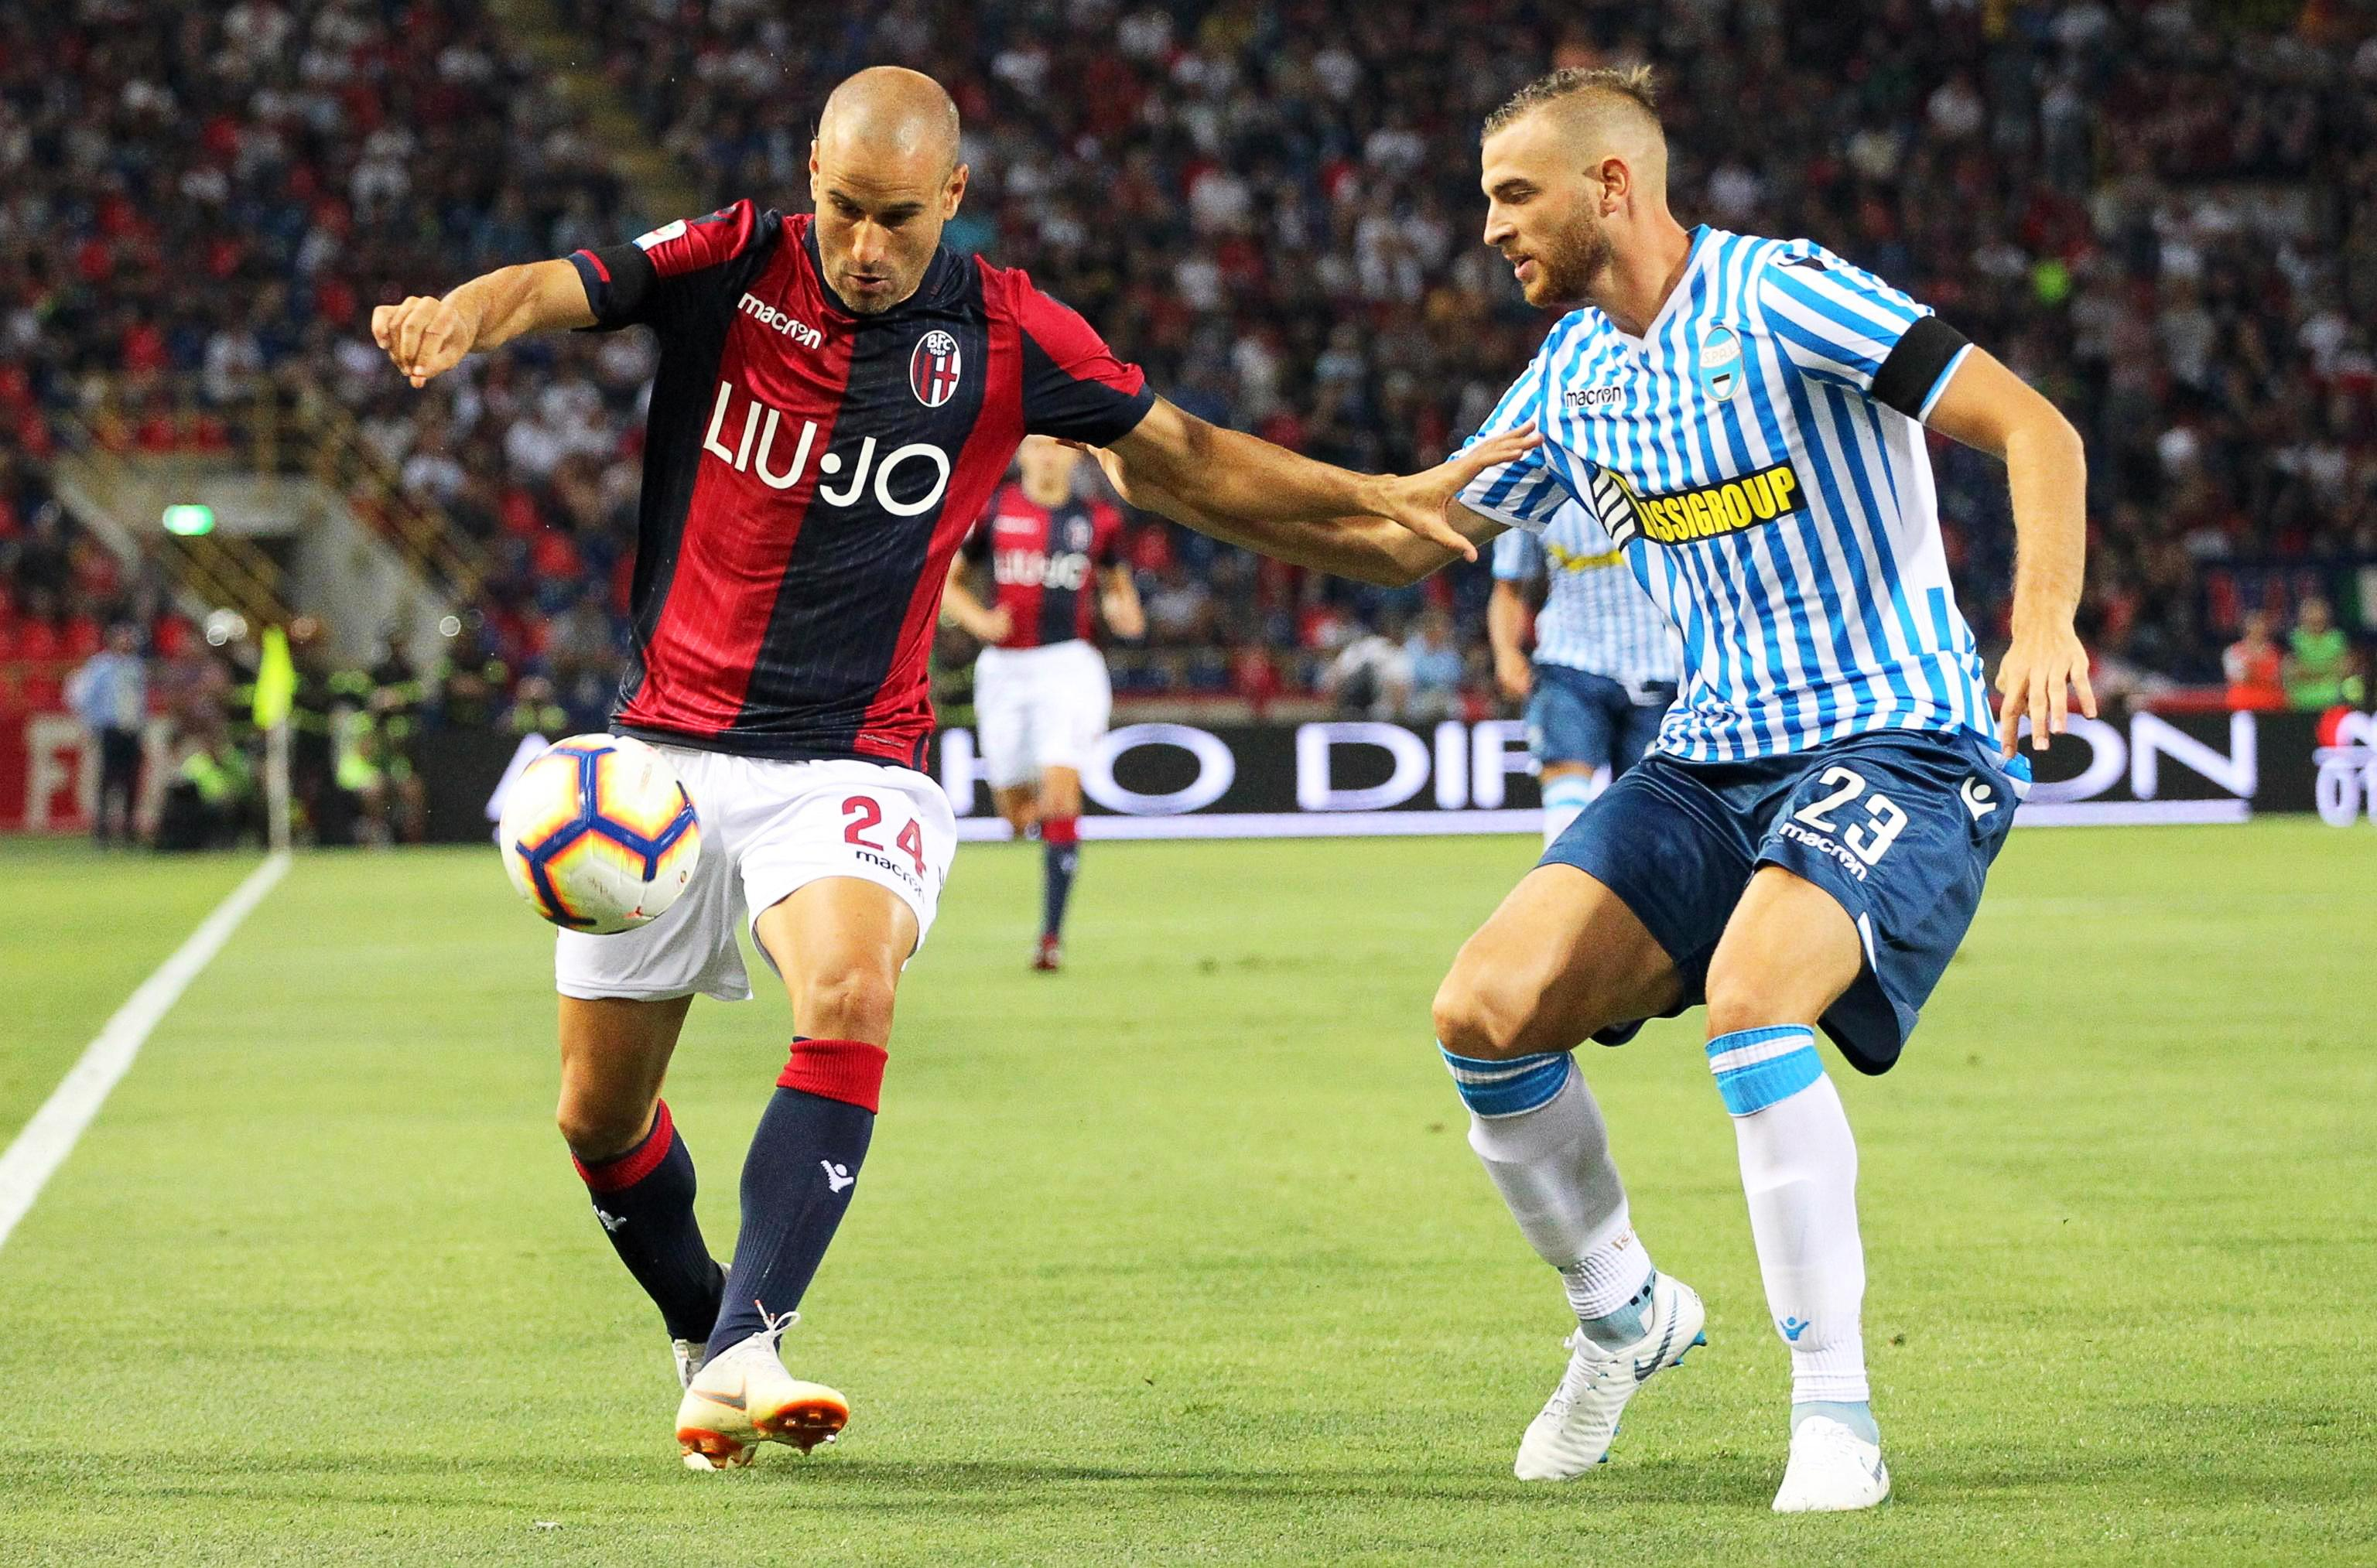 Former Inter Milan striker Rodrigo Palacio, left, will miss the game against his old club through injury